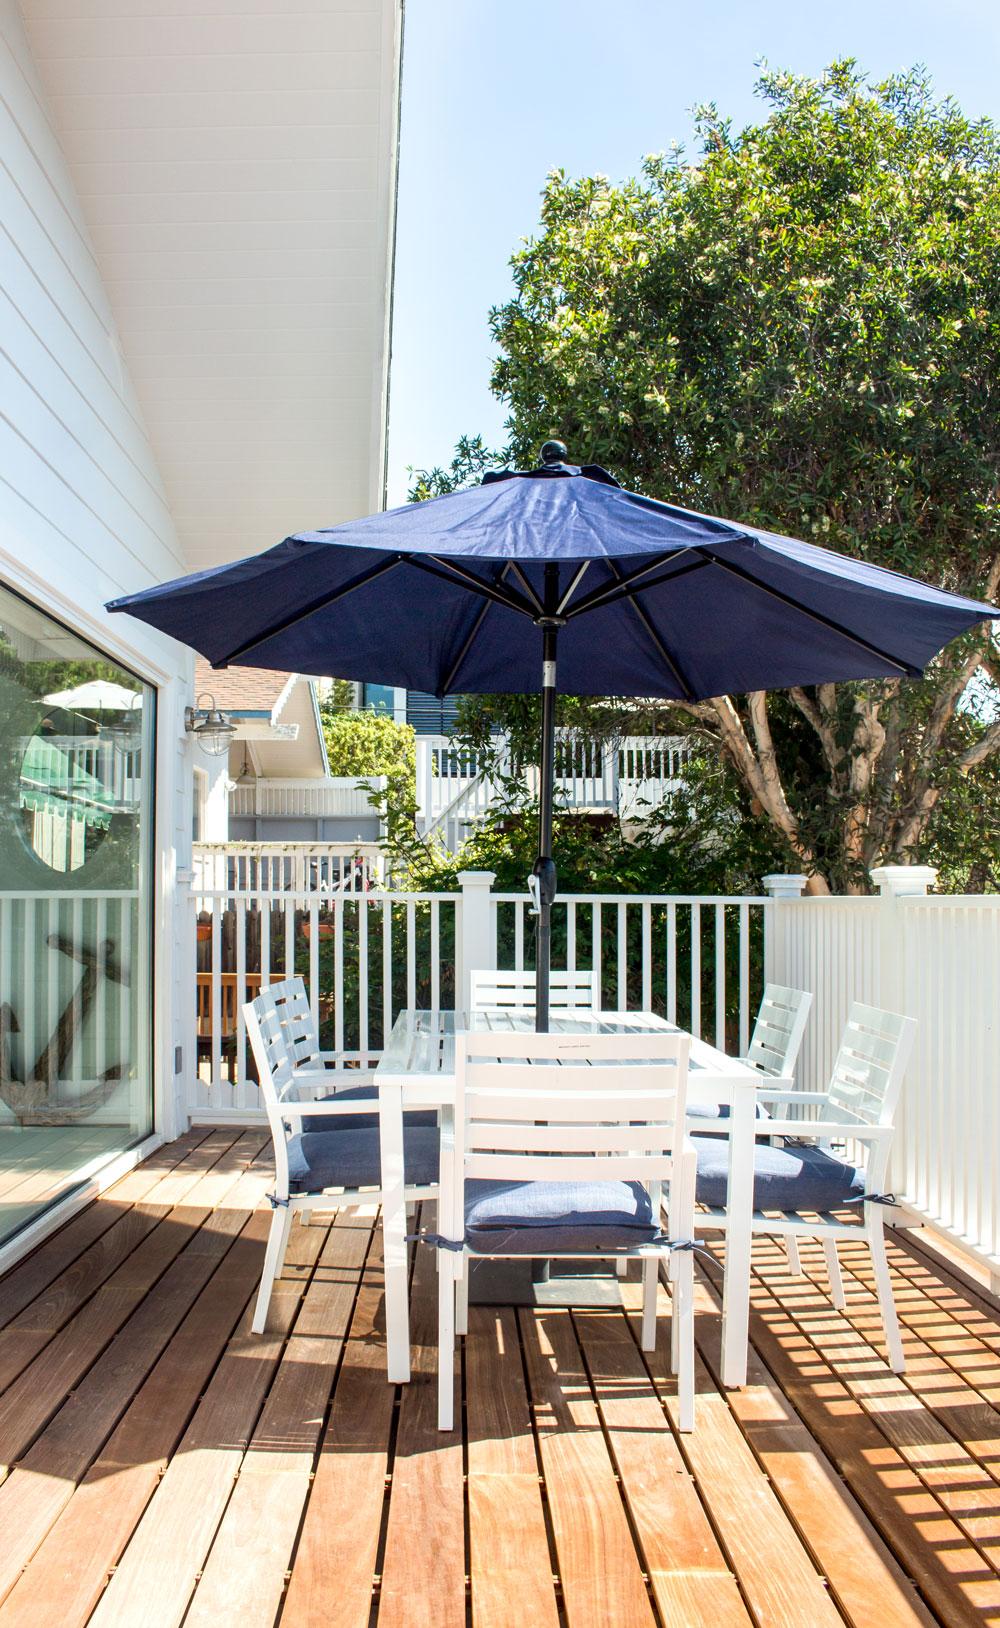 Chelsea-deck-patio-furniture-exterior.jpg